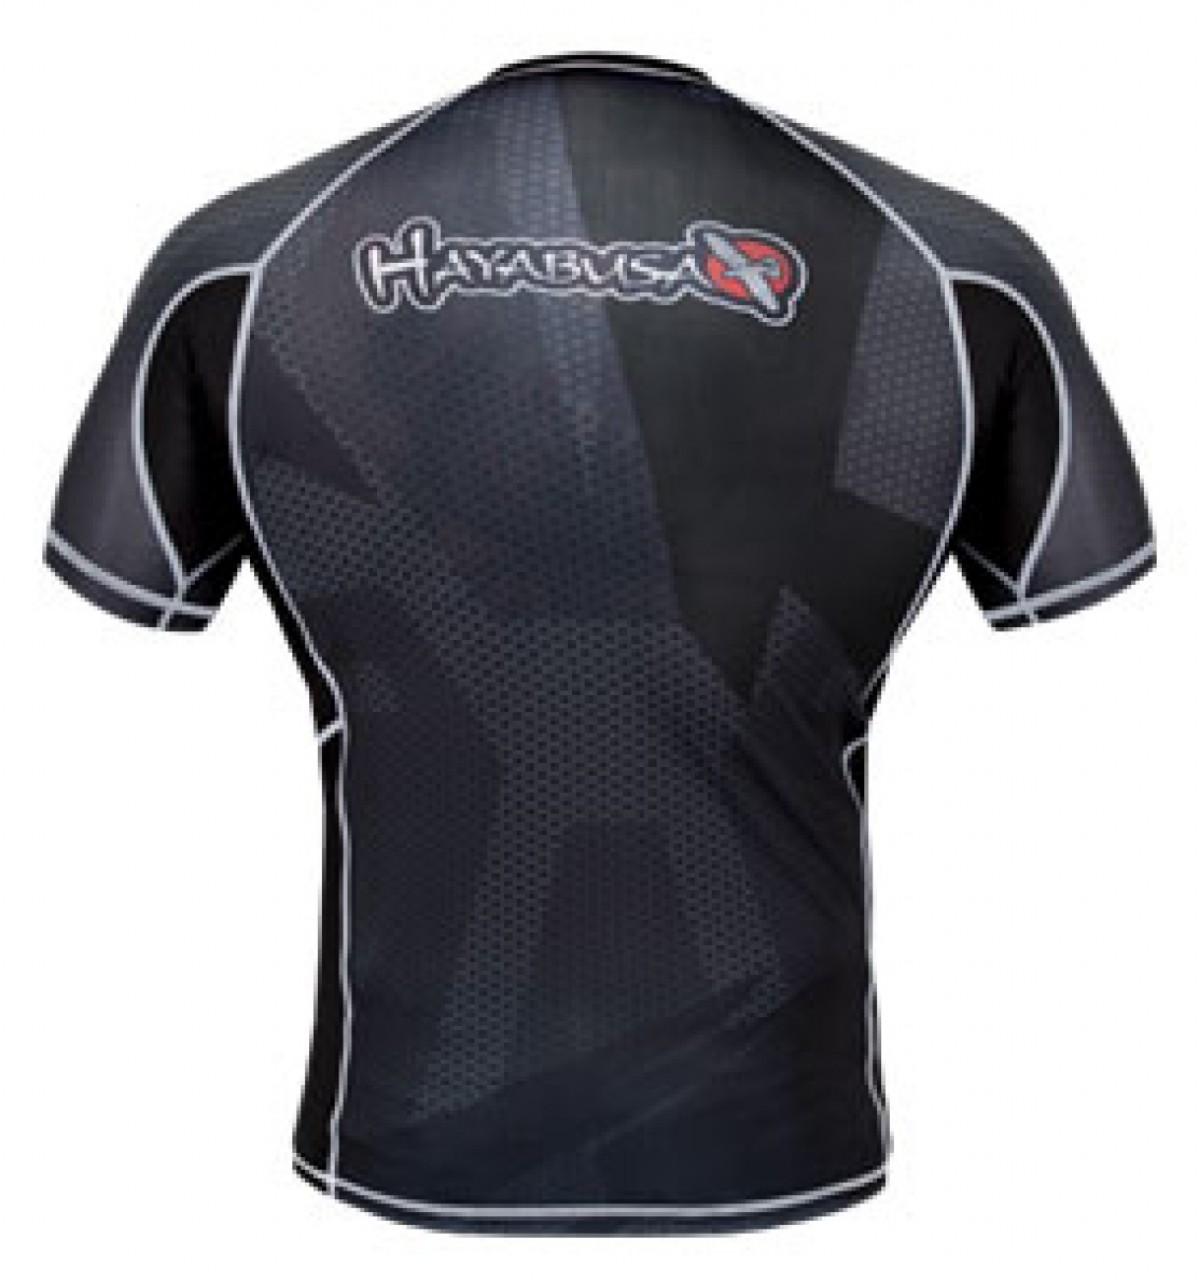 Hayabusa Metaru 47 Silver Rashguard Short Sleeve - Black